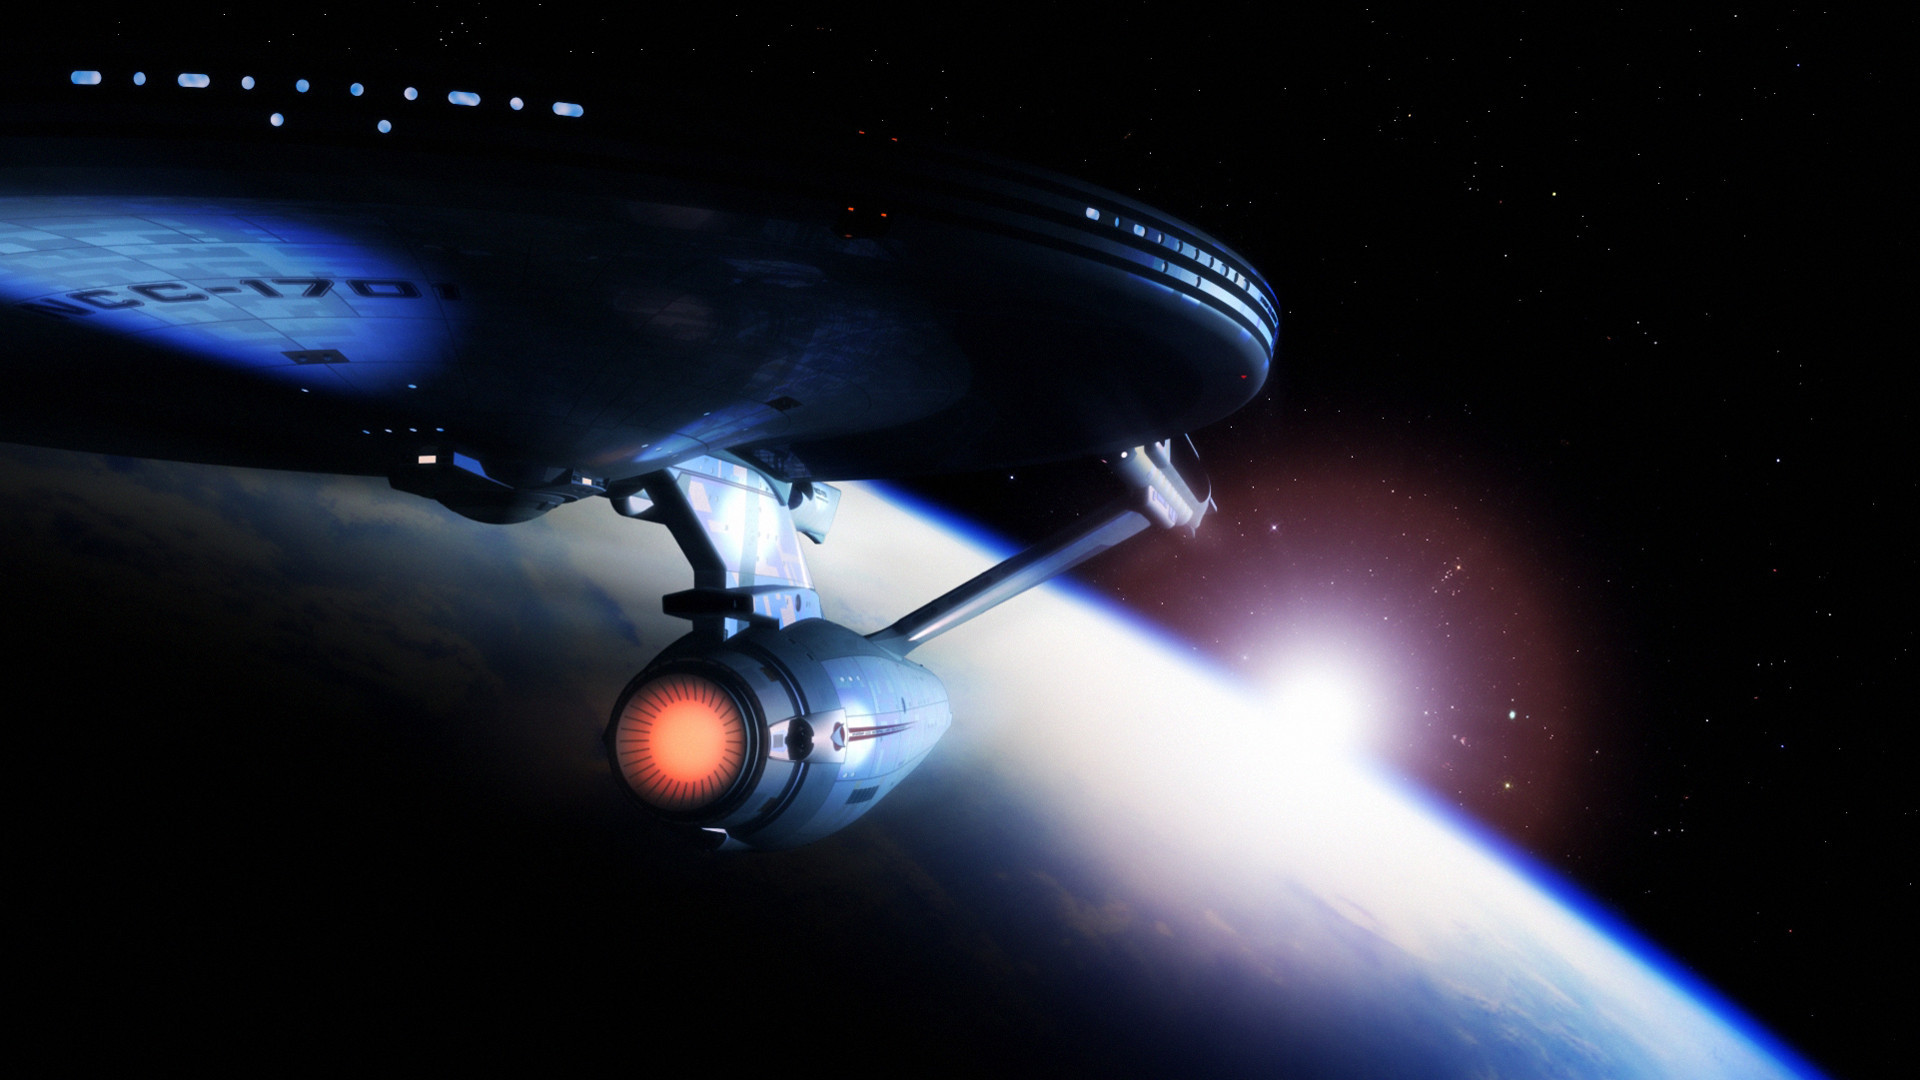 Star Trek Motion Picture Trilogy Movie HD free download 720p